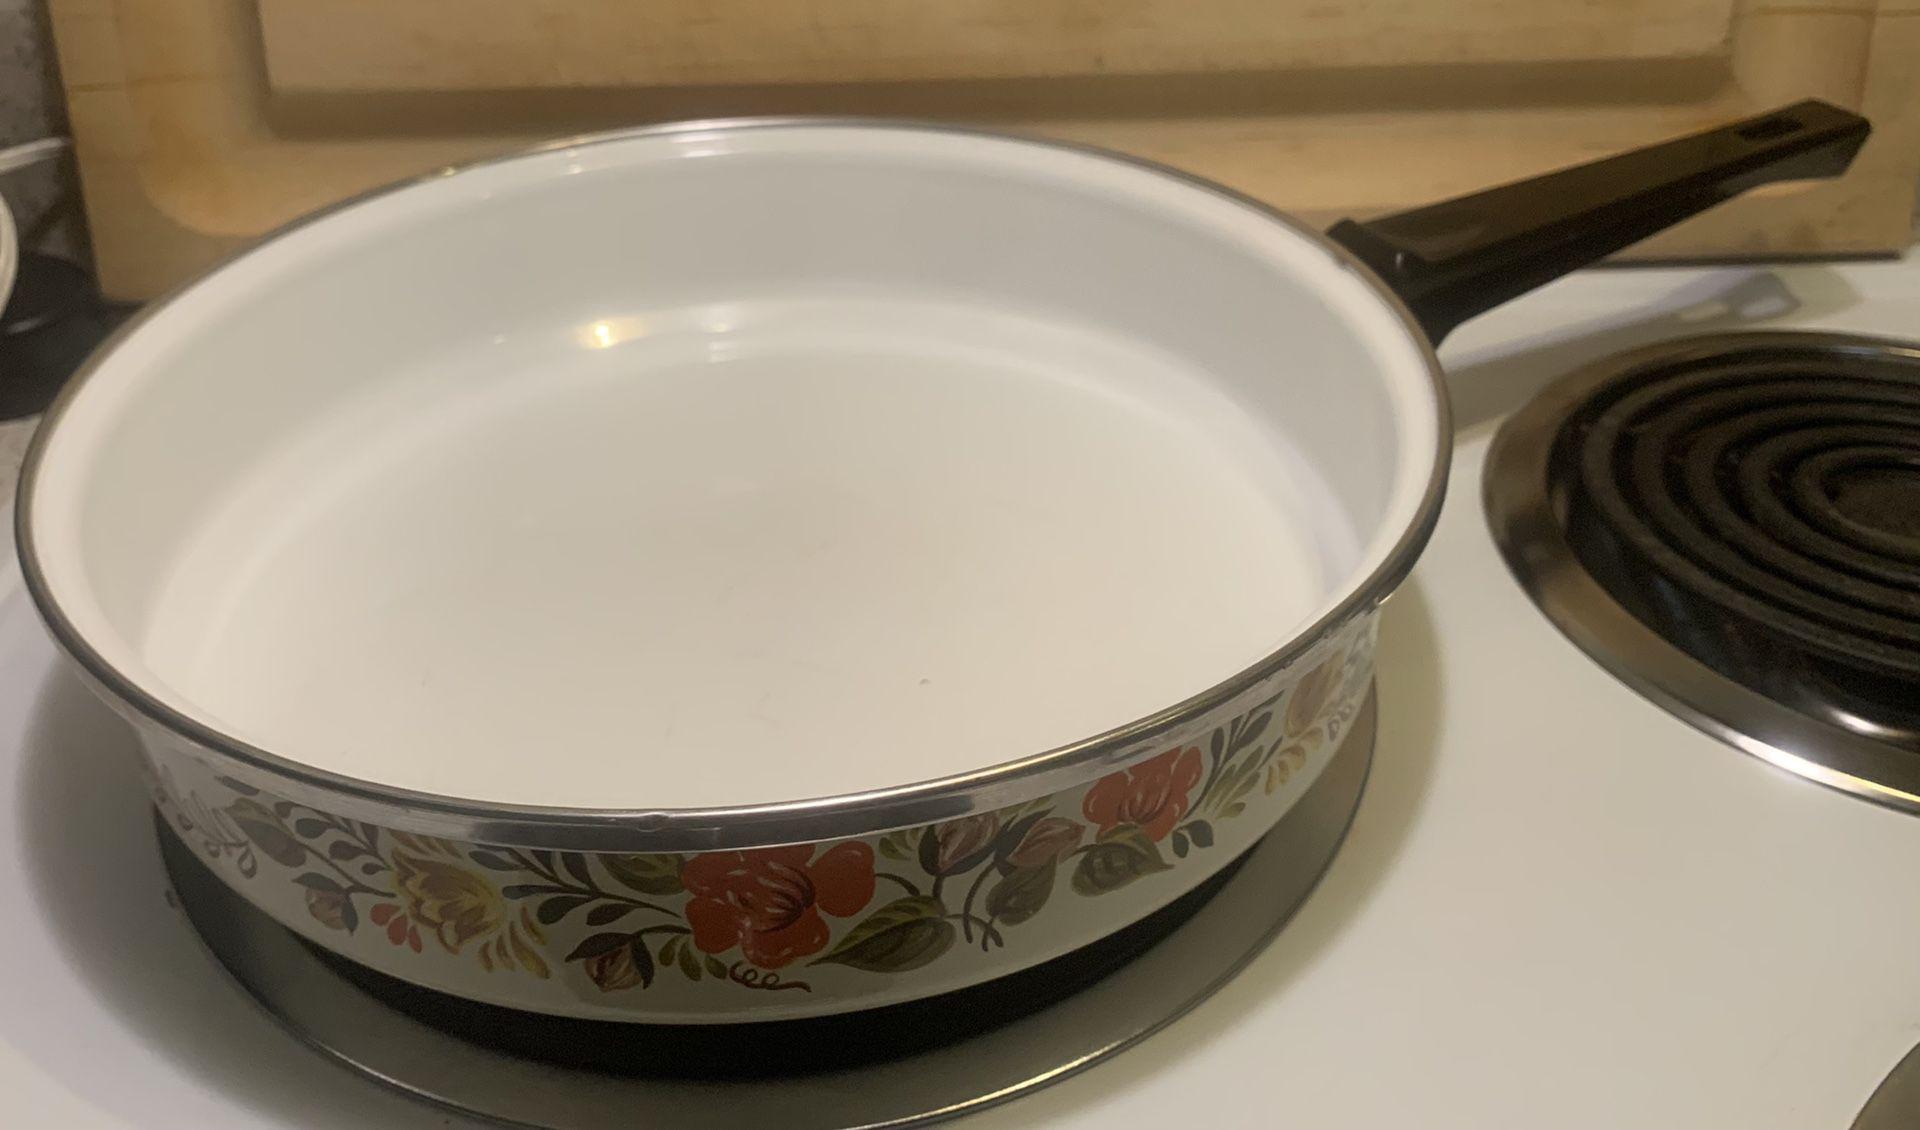 Kitchen Accessories / Wilshire House Frying Pan